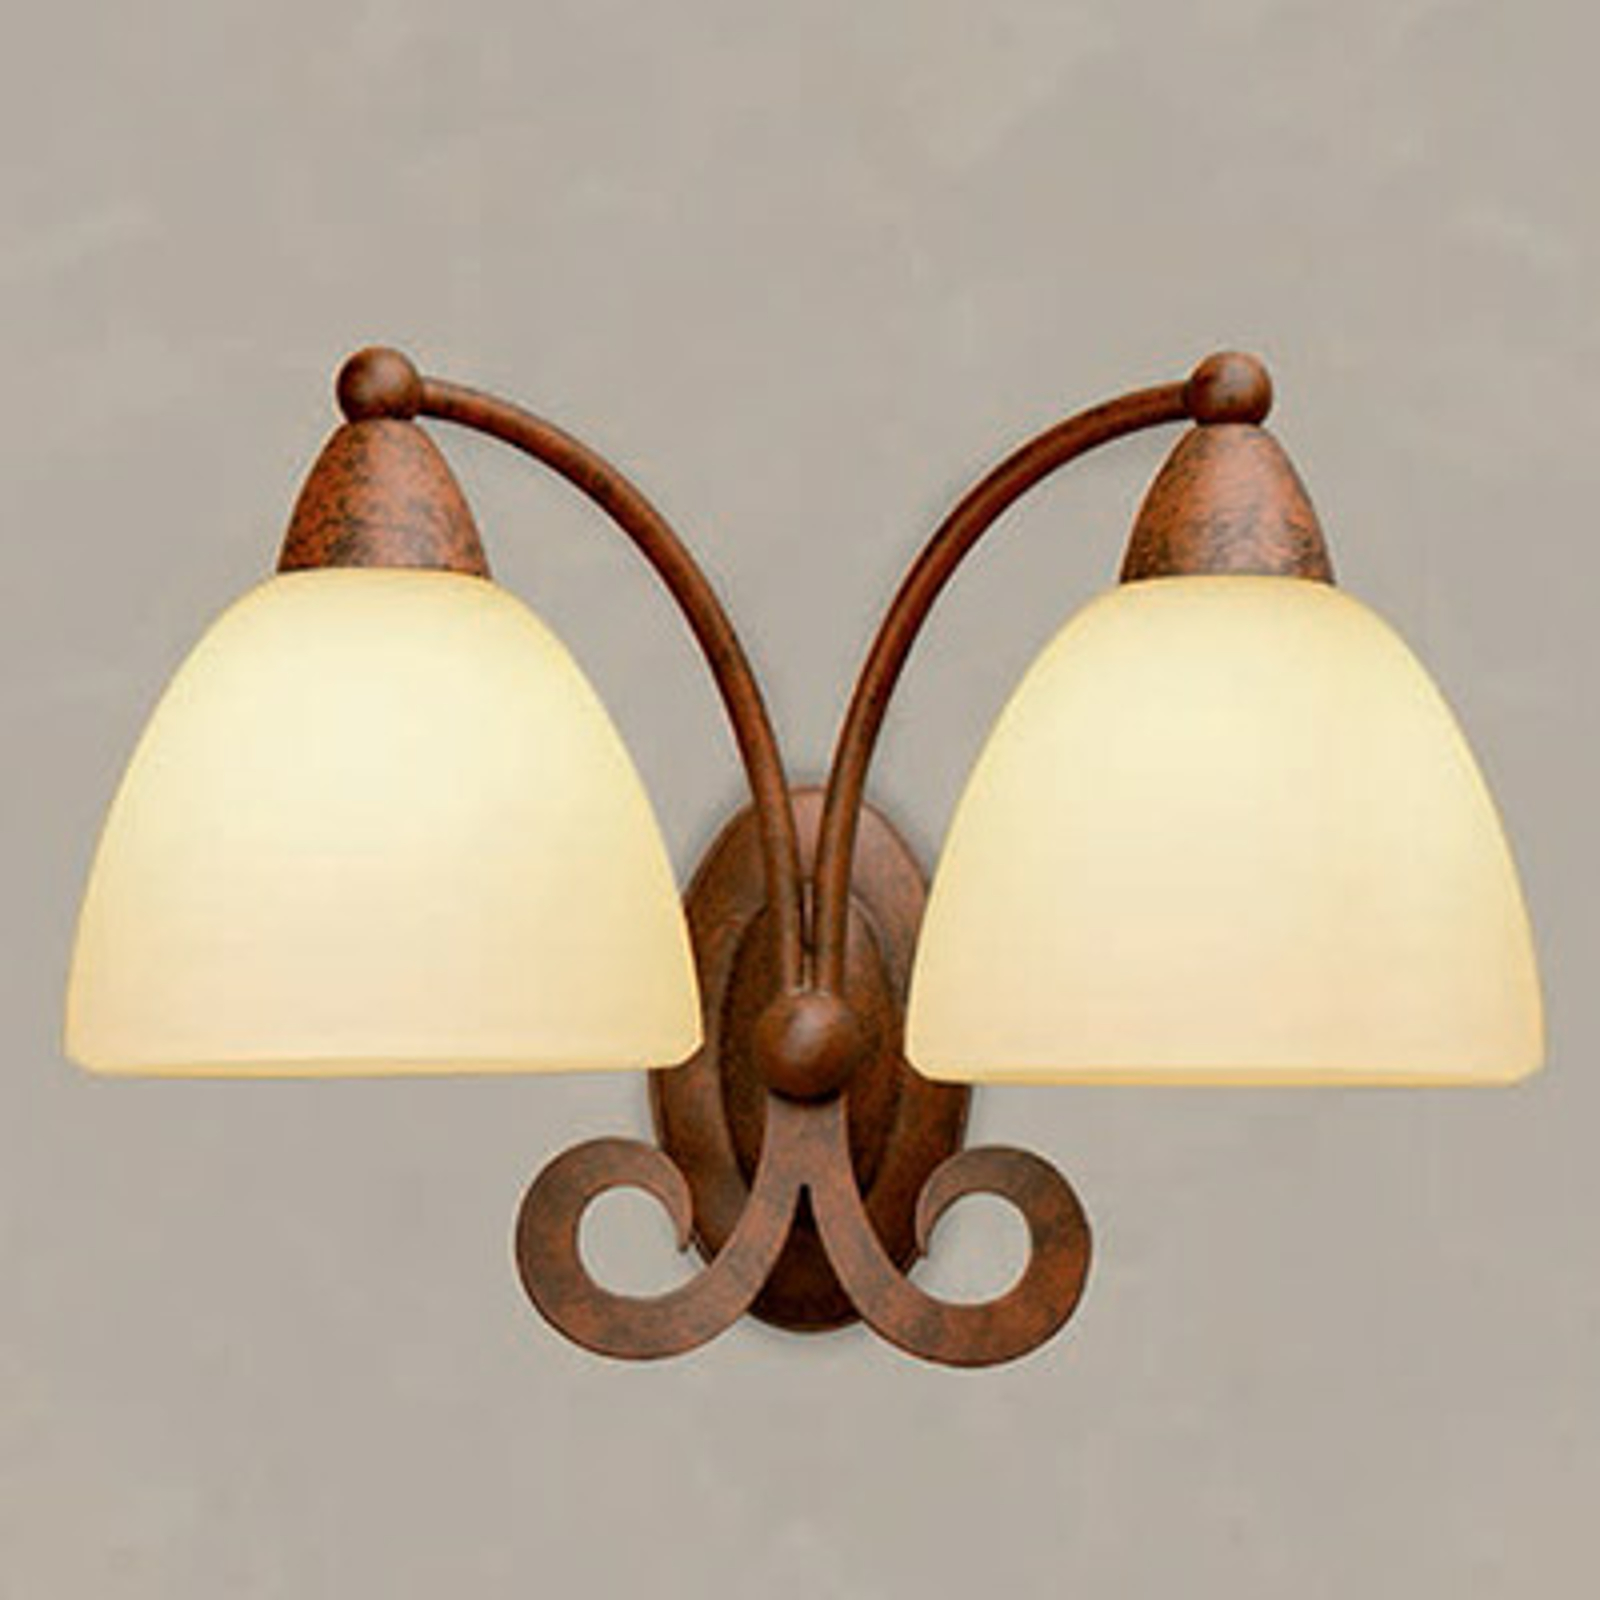 Wandlamp Ginevra met twee lichtbronnen